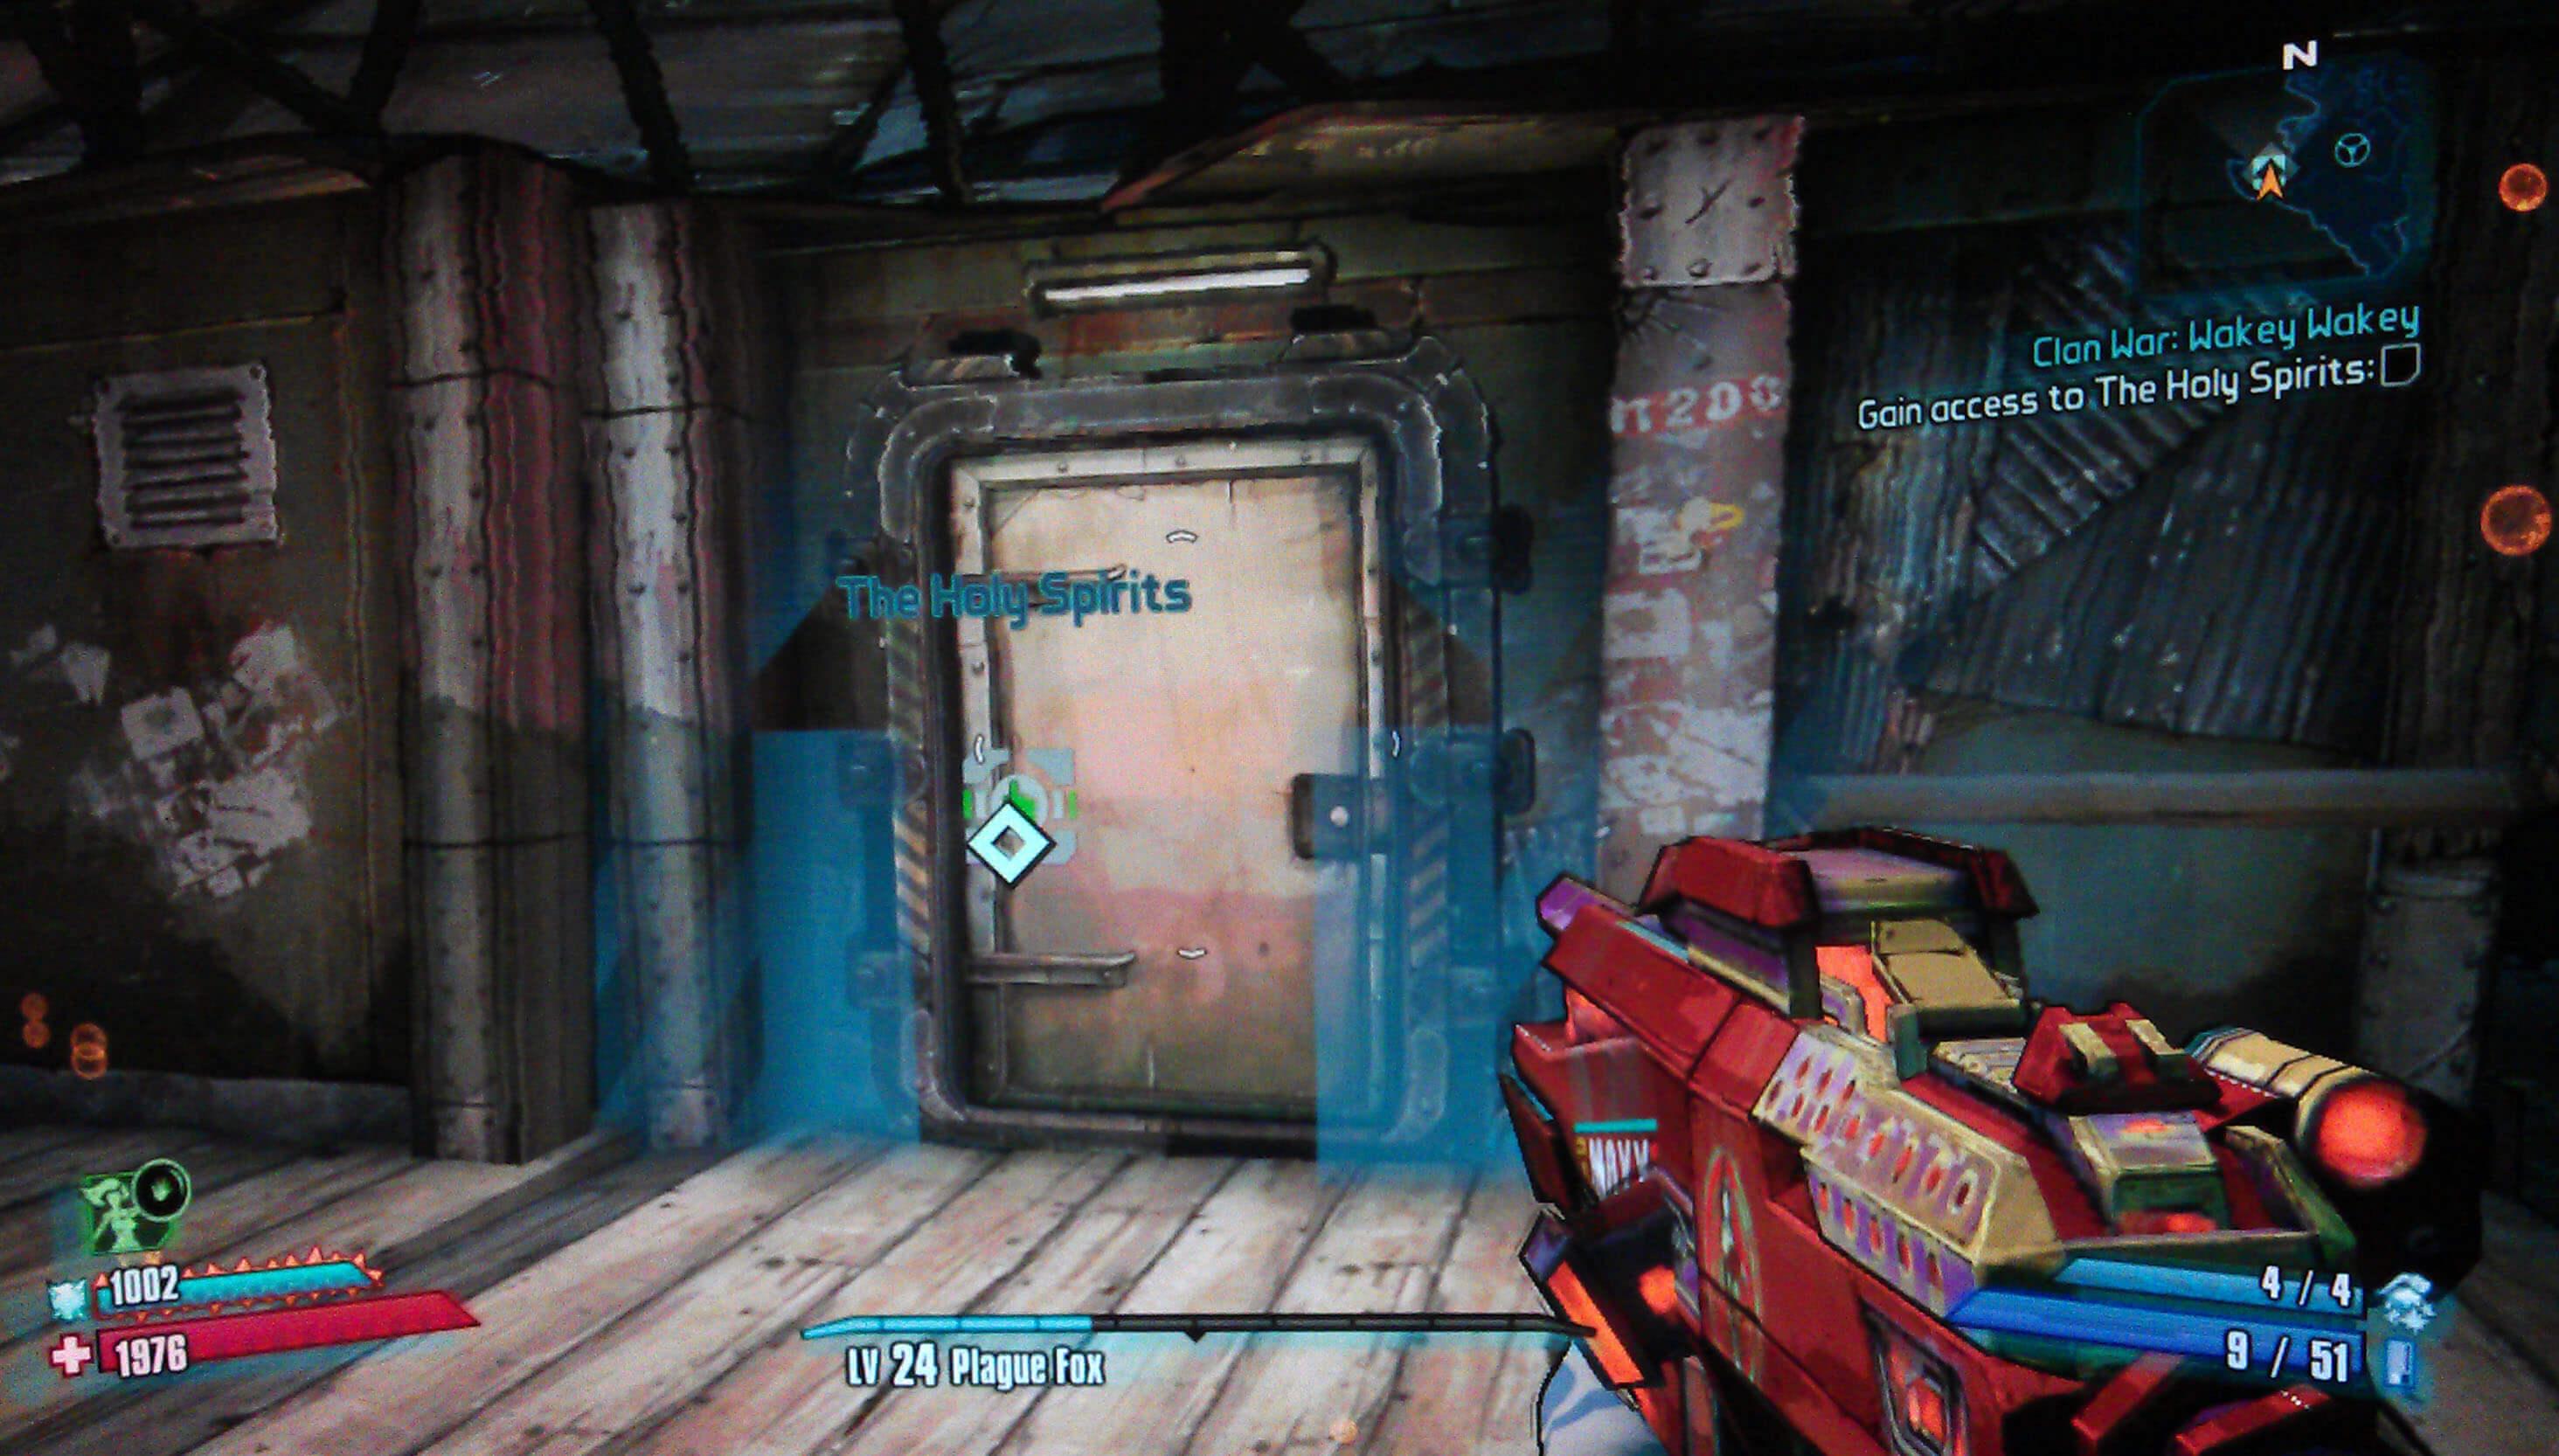 Borderlands 2 Clan War: Wakey Wakey Walkthrough - Video Games, Wikis